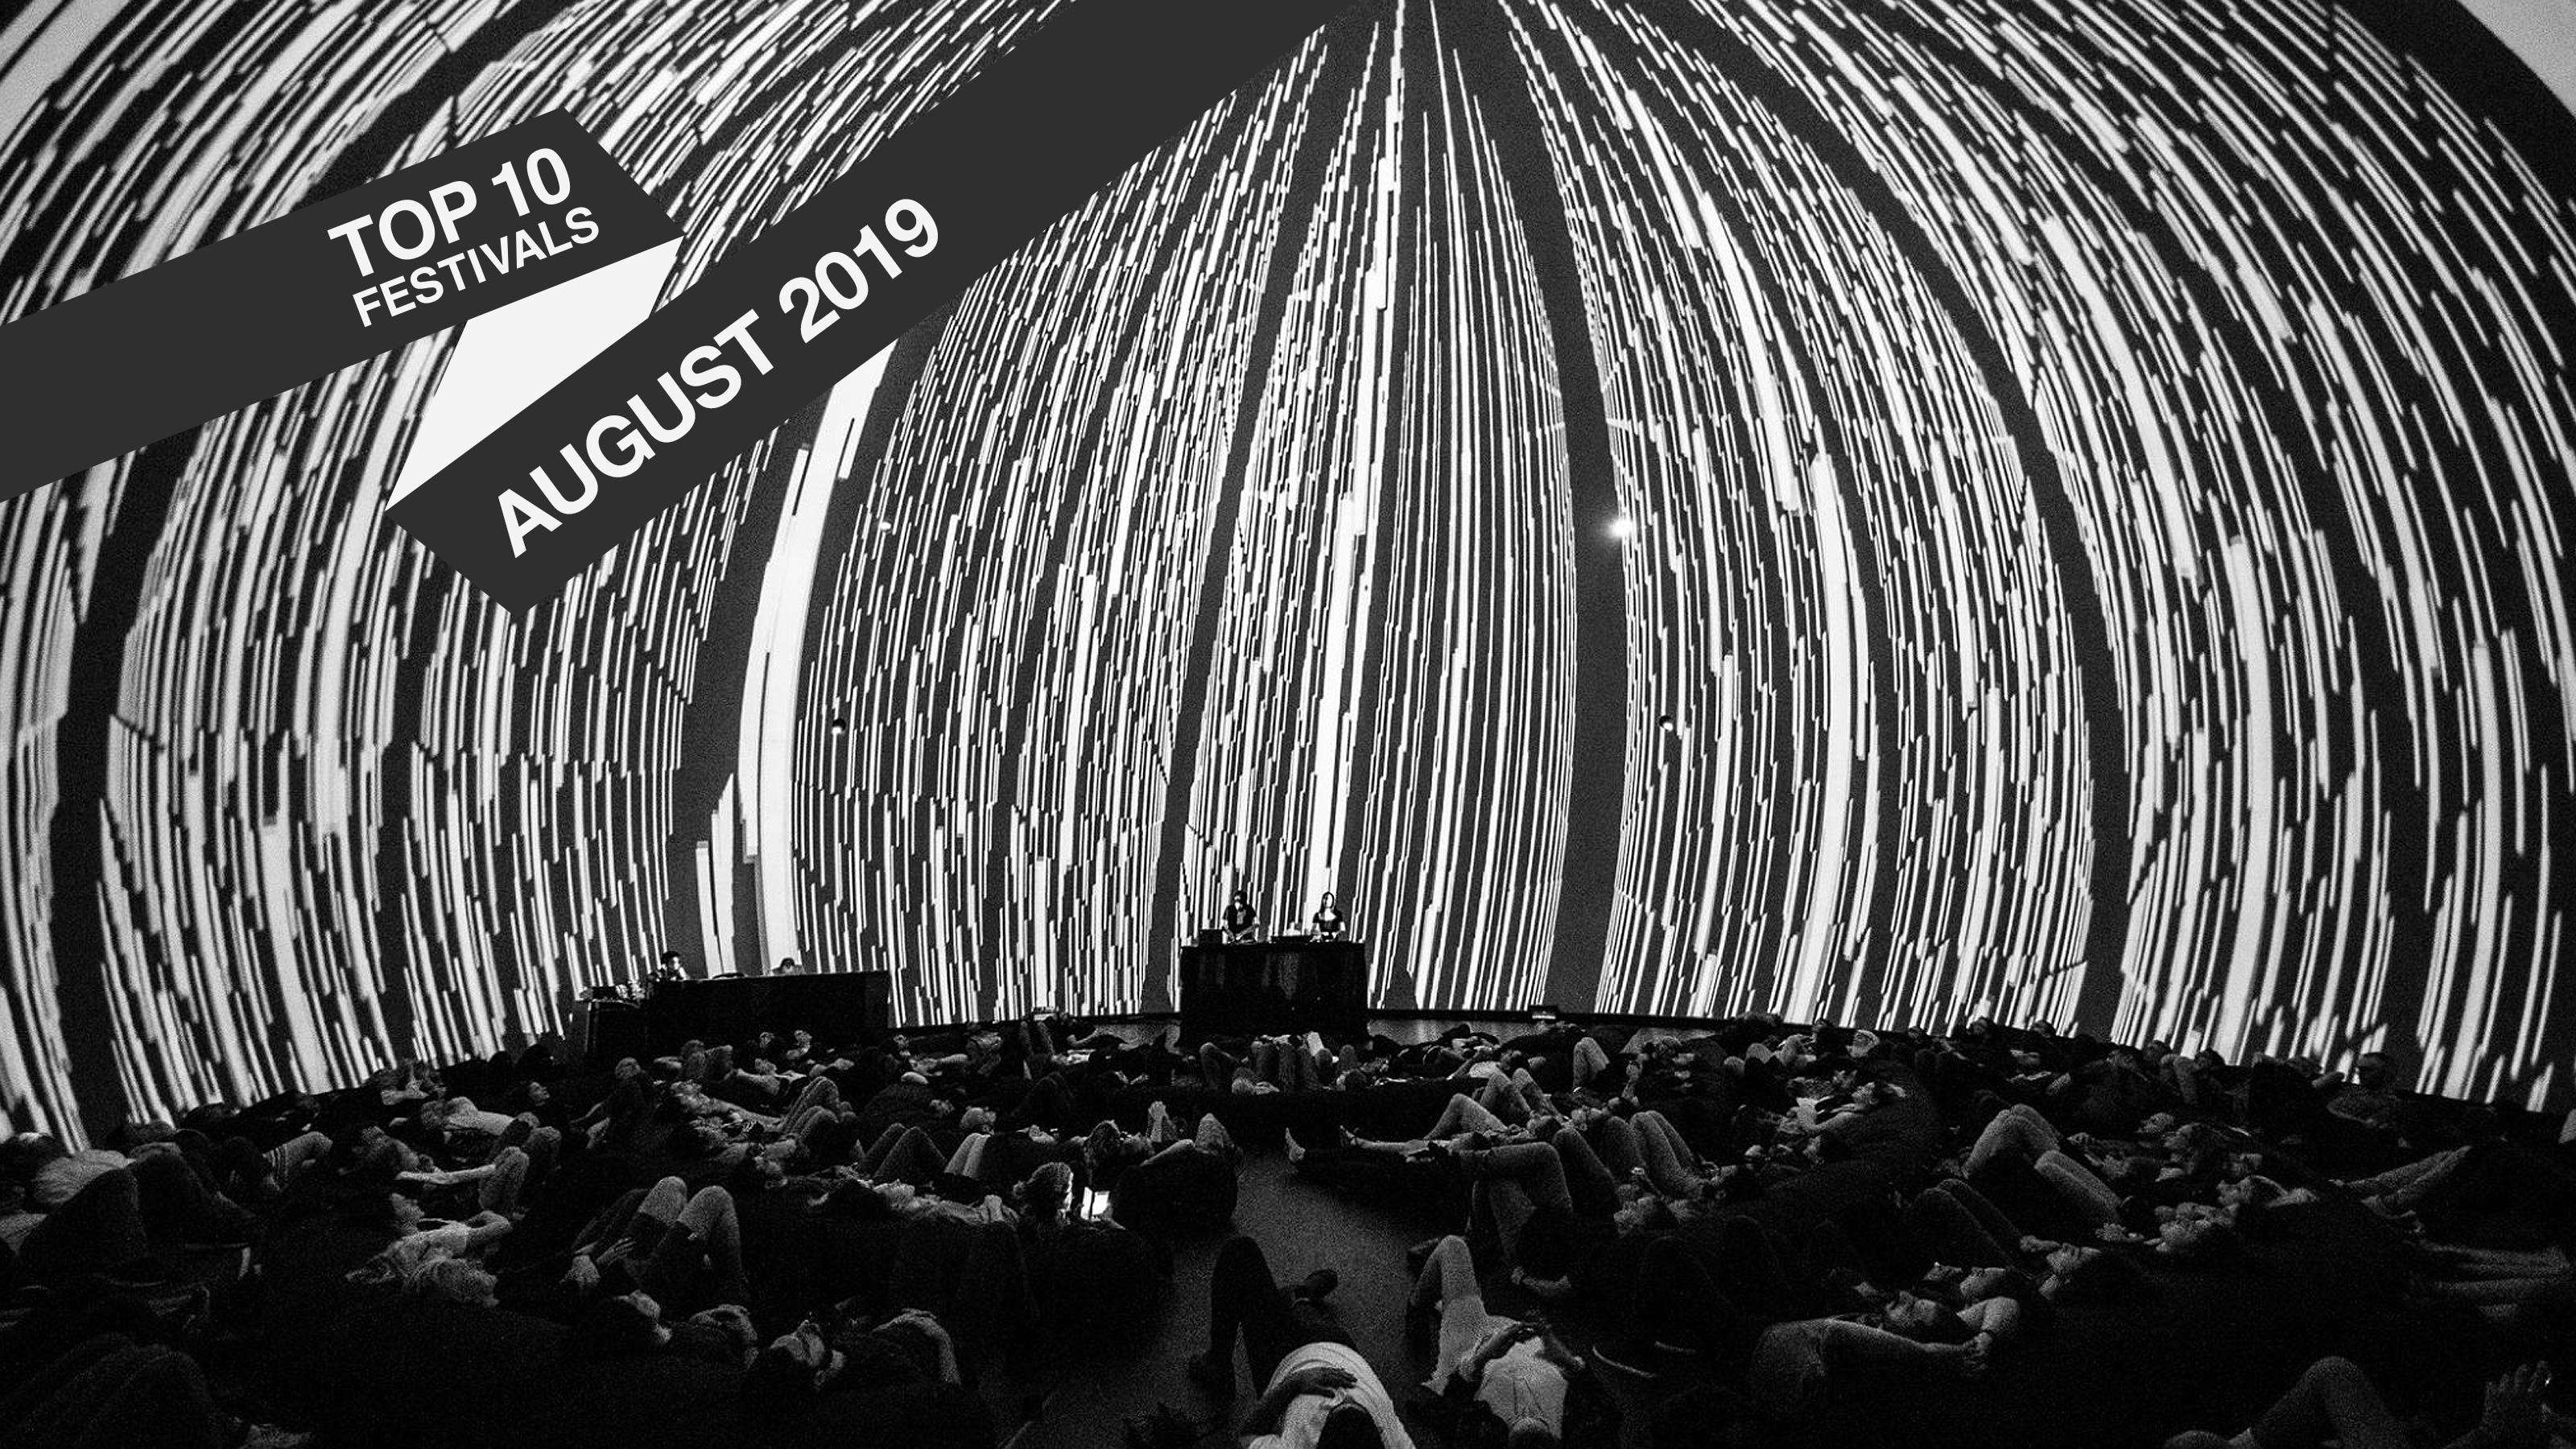 RA: Top 10 August 2019 Festivals